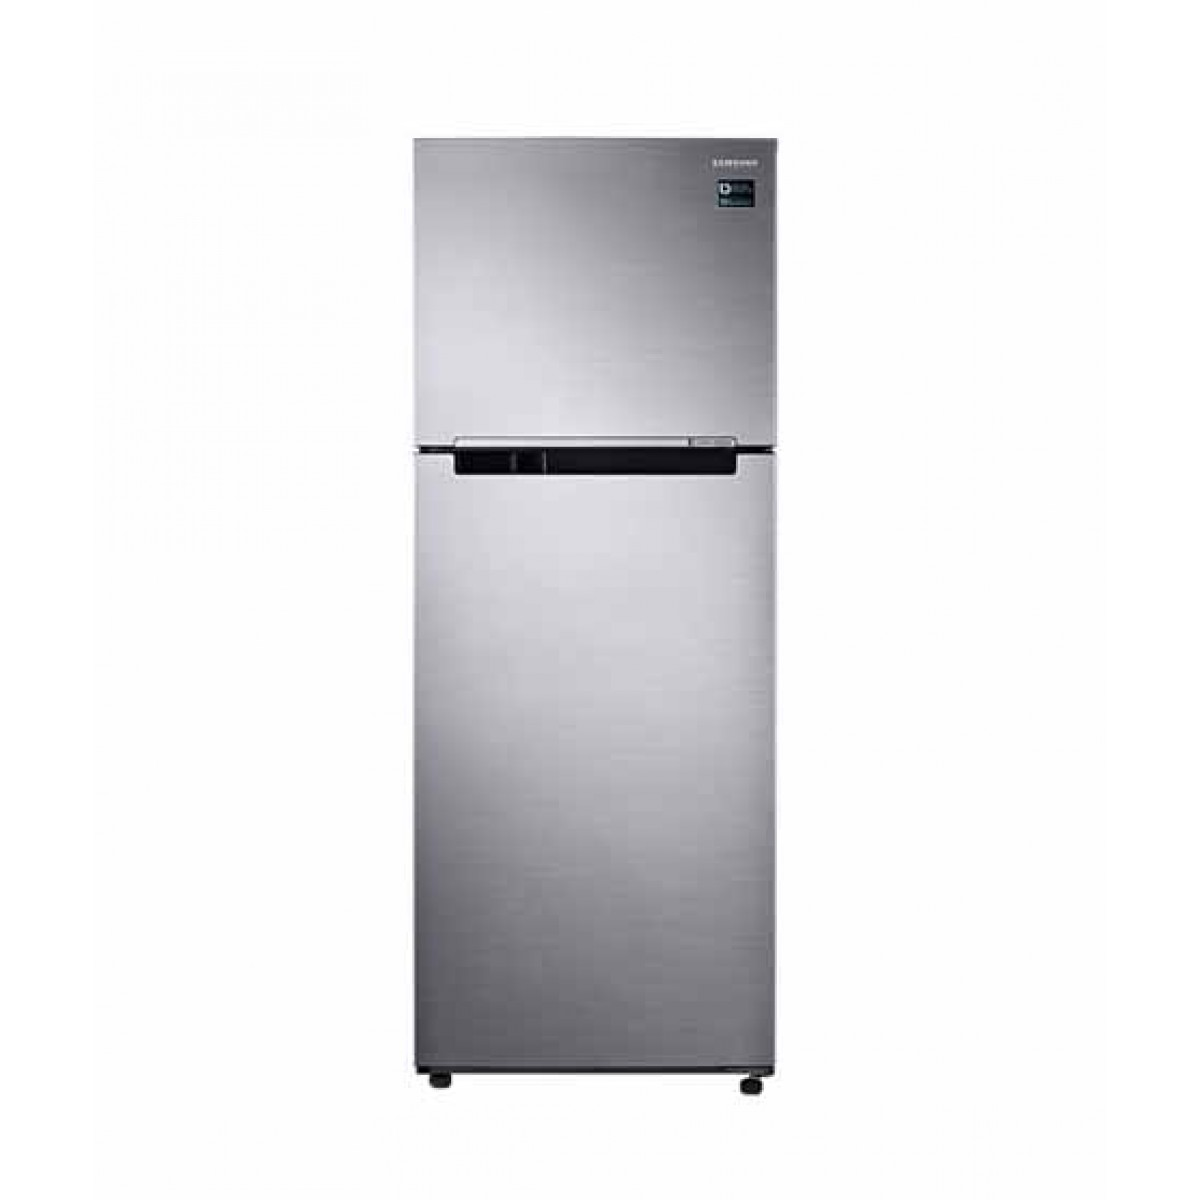 Samsung Freezer-on-Top Refrigerator 18 cu ft (RT50K5010S8)